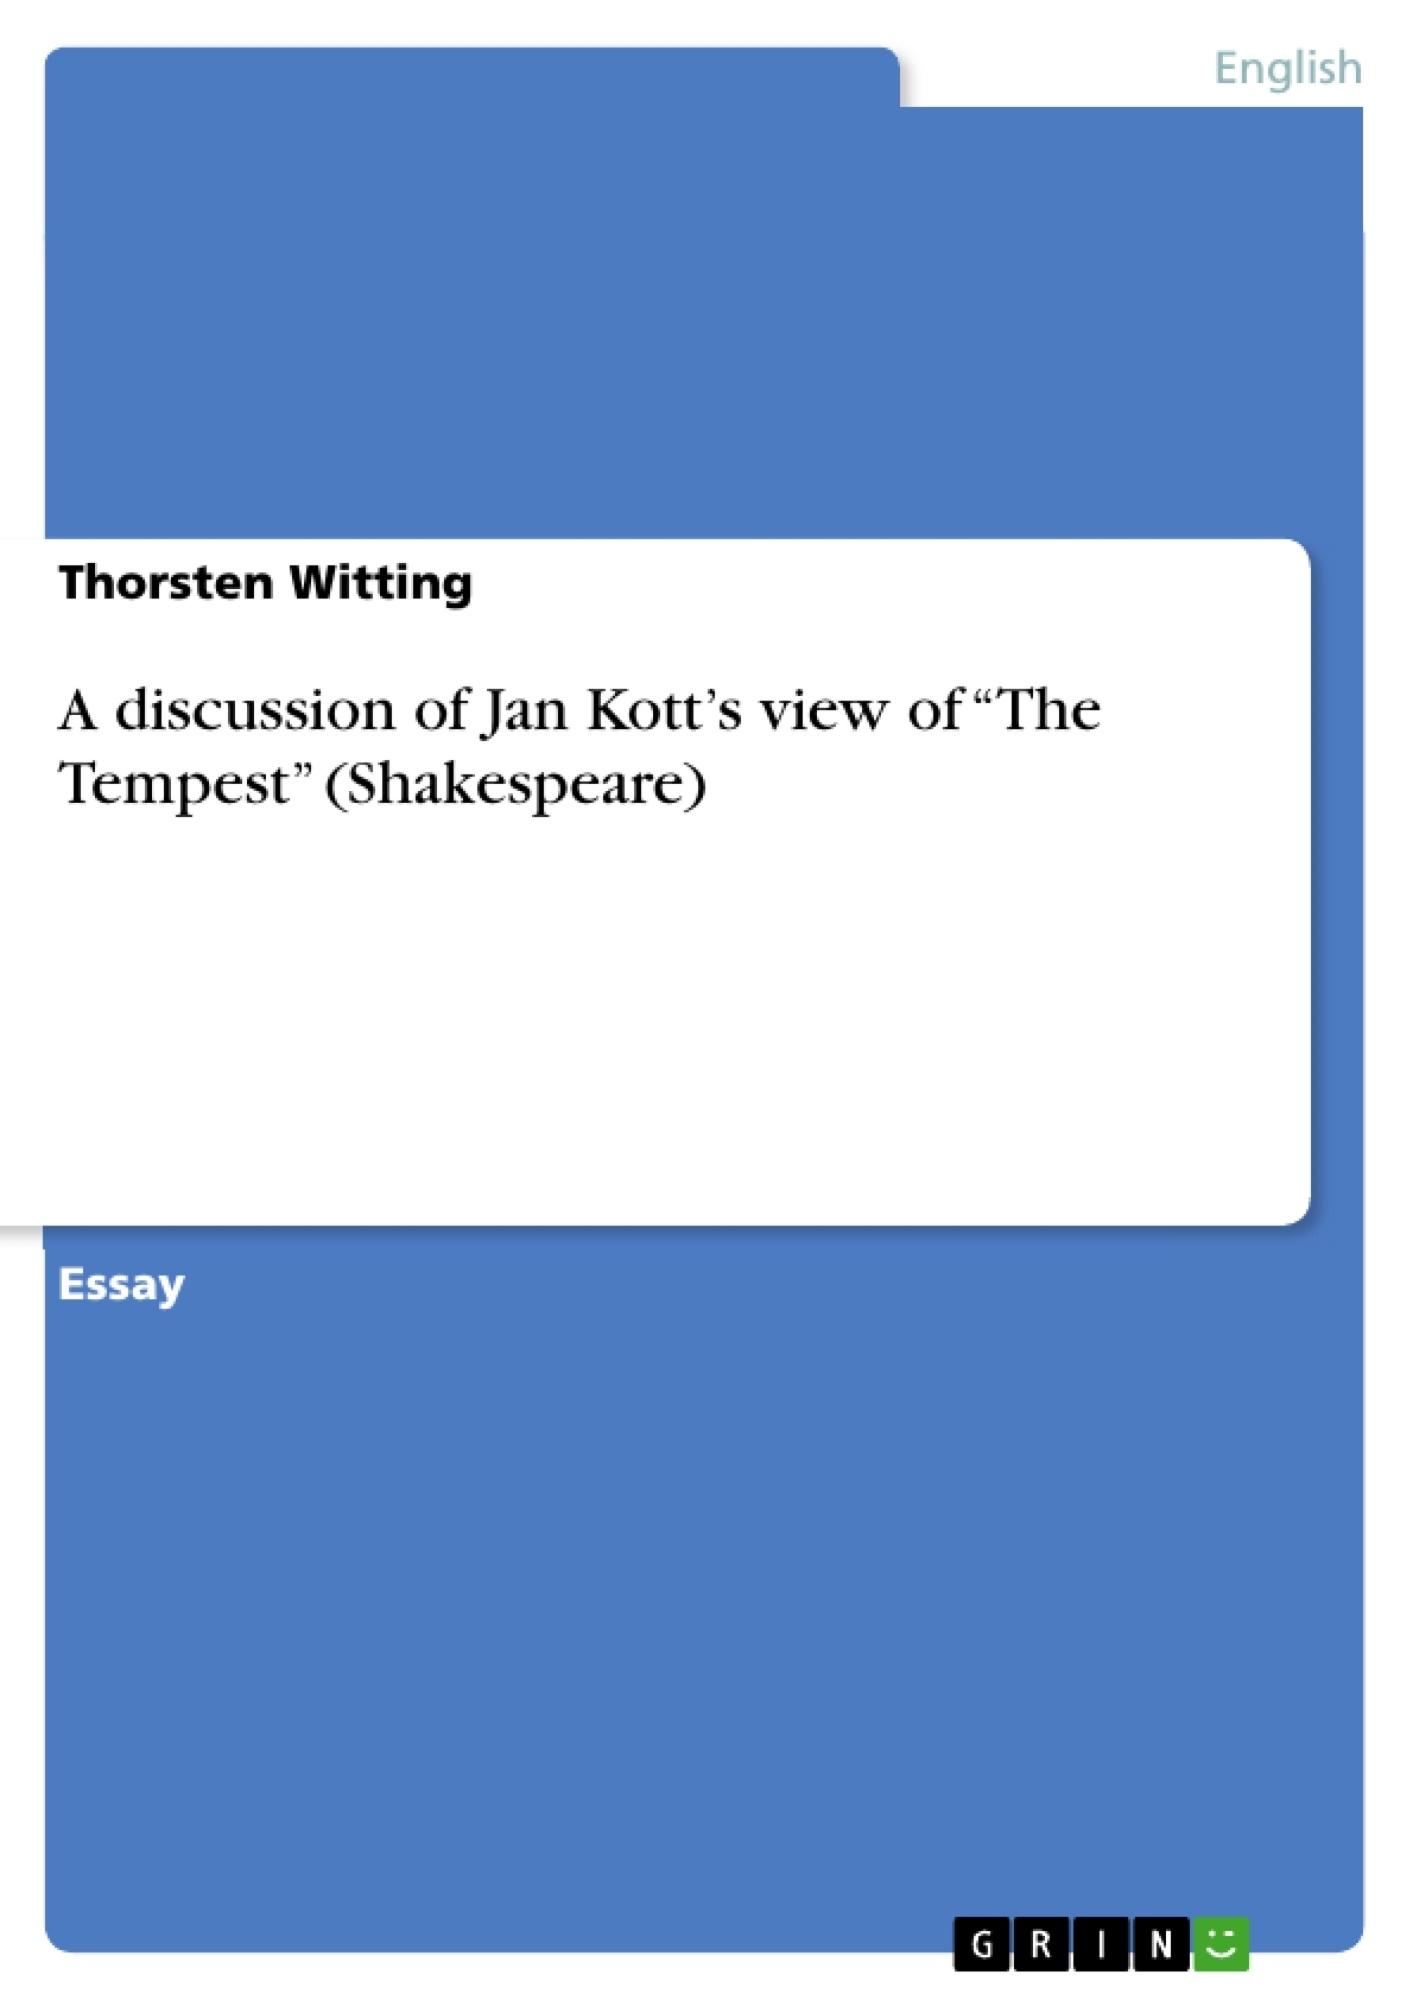 English writing grammar textbooks supplies bju press power tempest essay essay about nature biocorpaavc